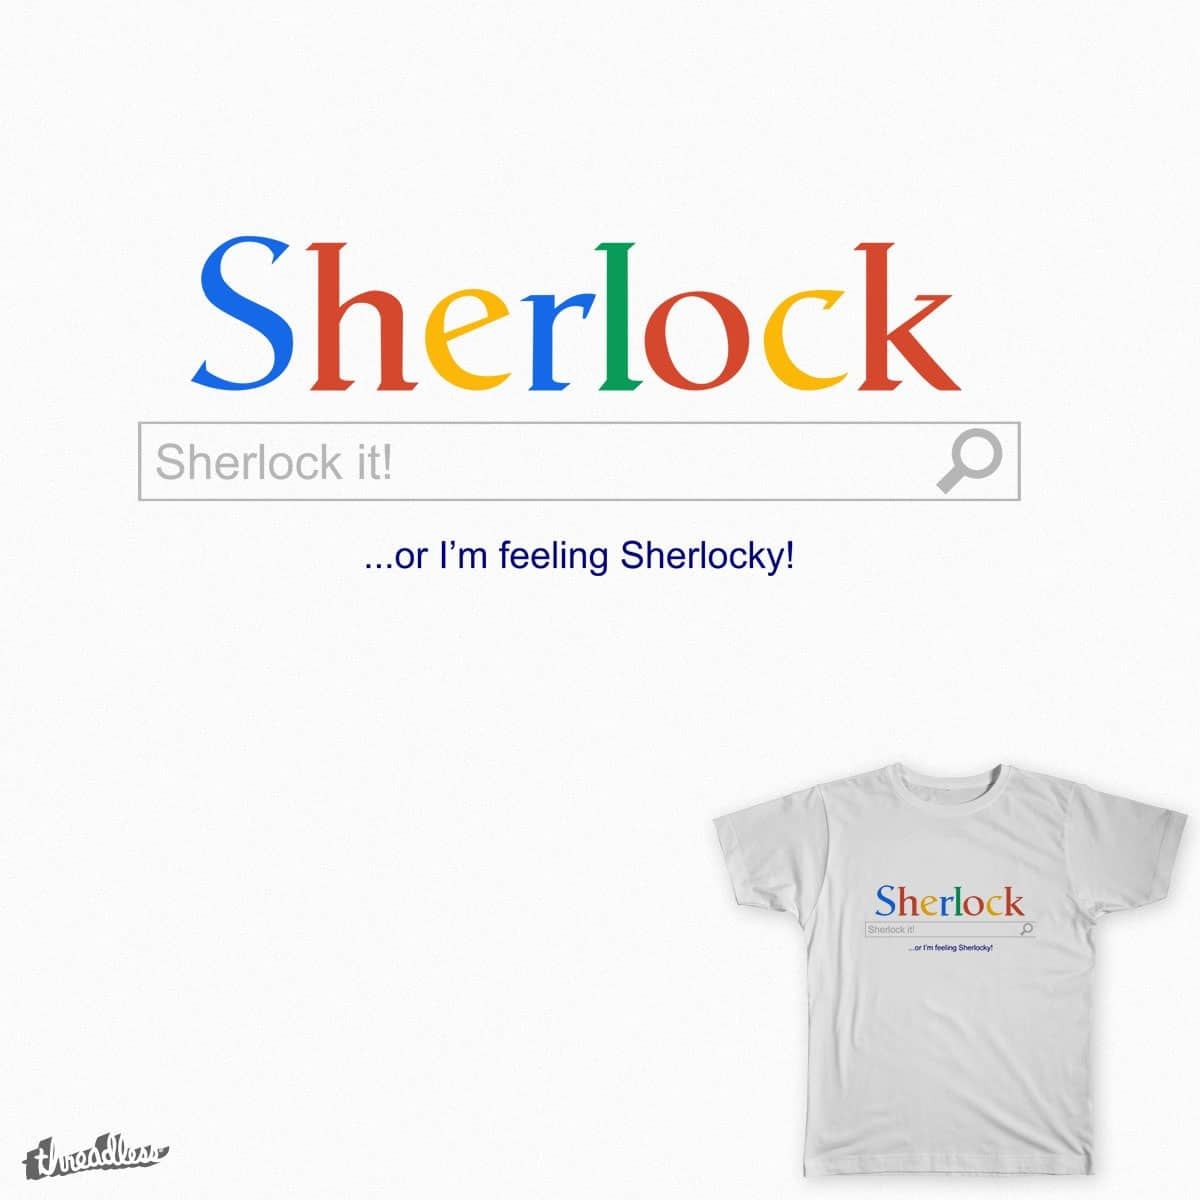 Sherlocking by mestre on Threadless